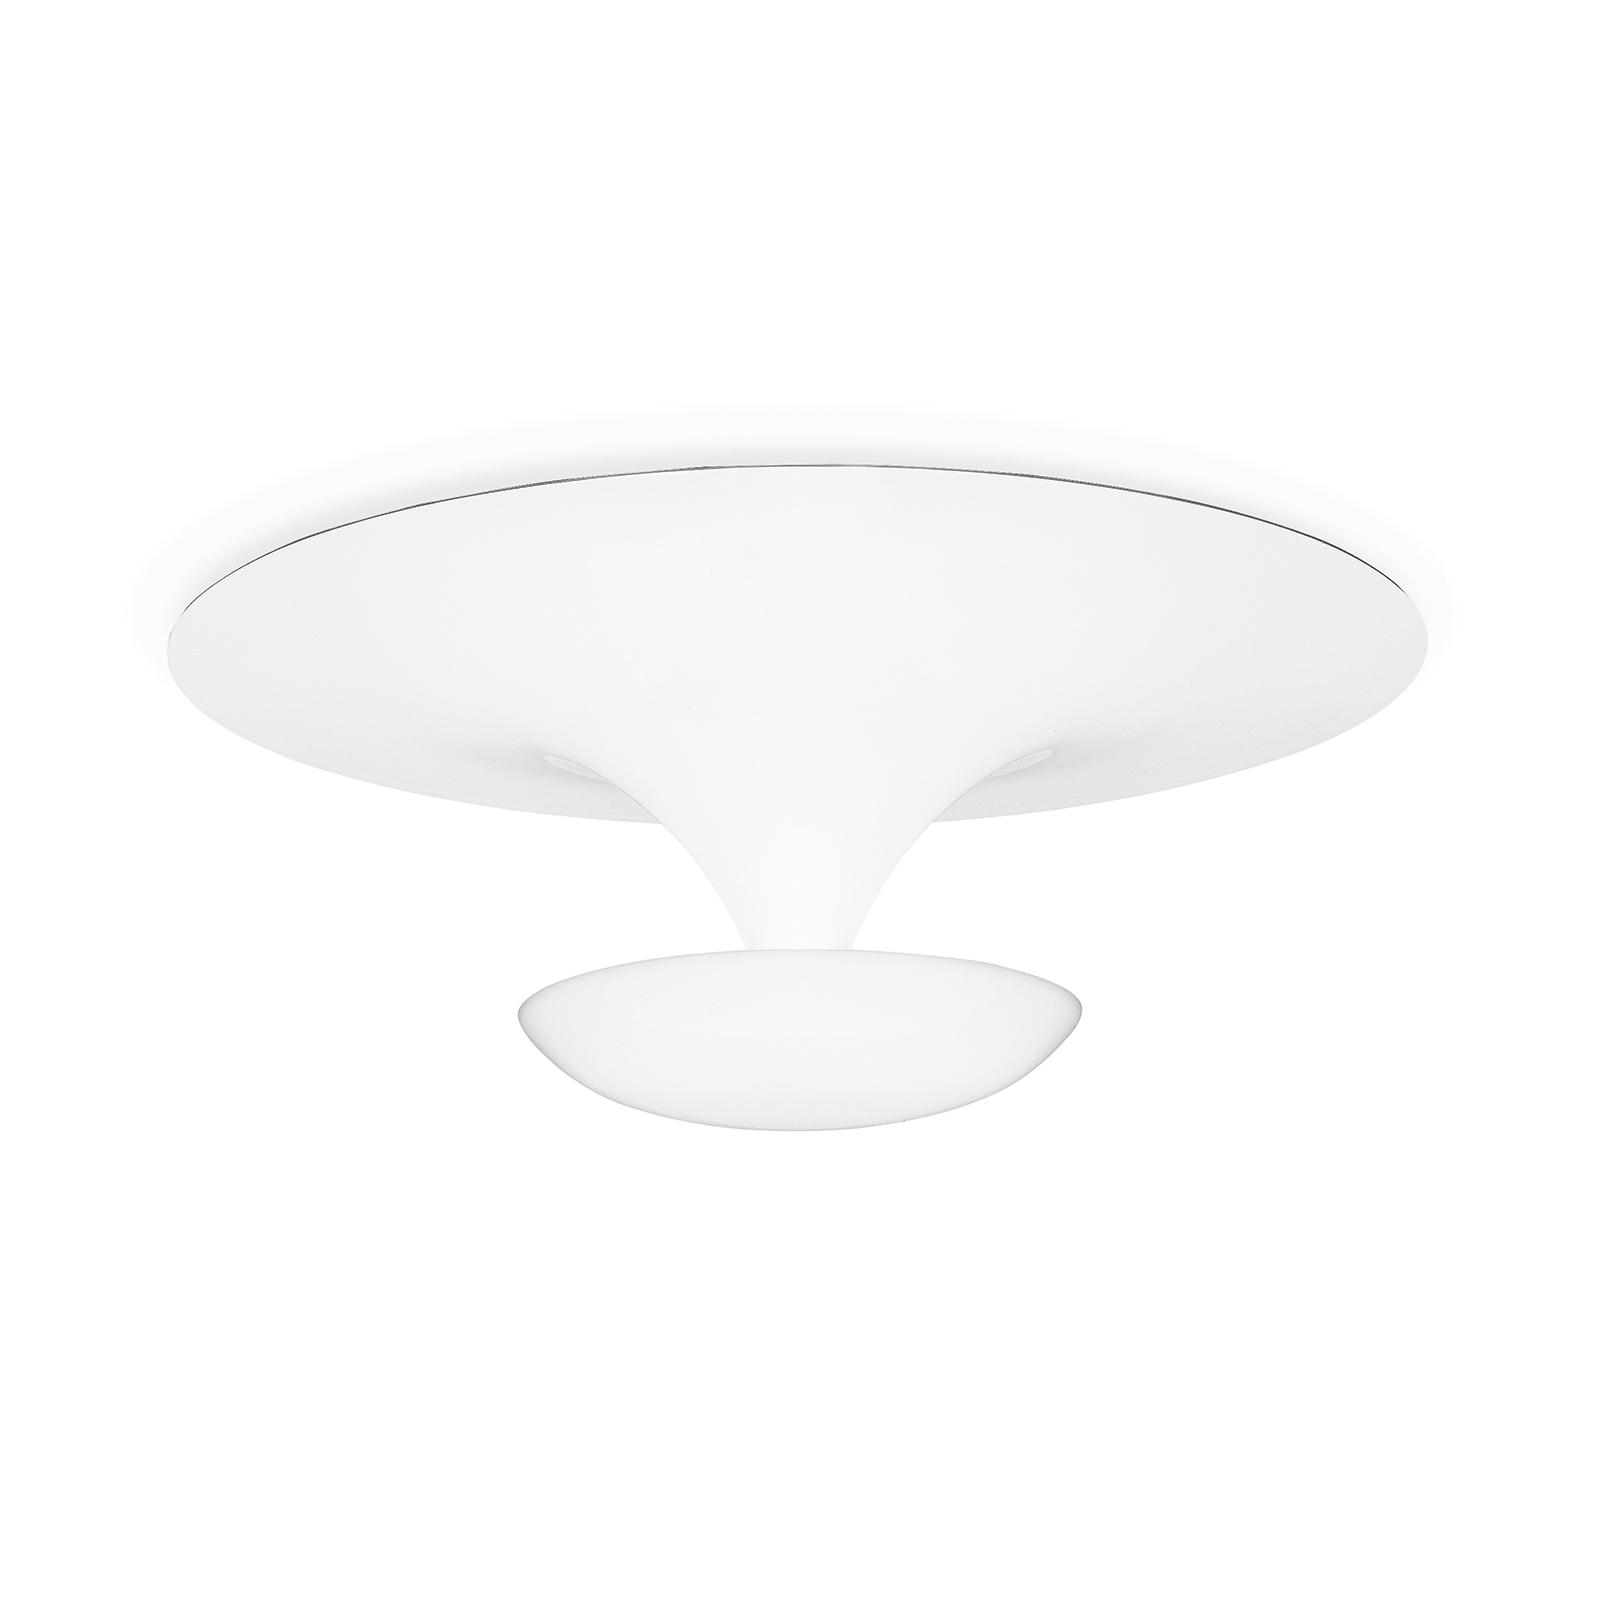 Vibia Funnel - lampa sufitowa 50 cm, biała matowa